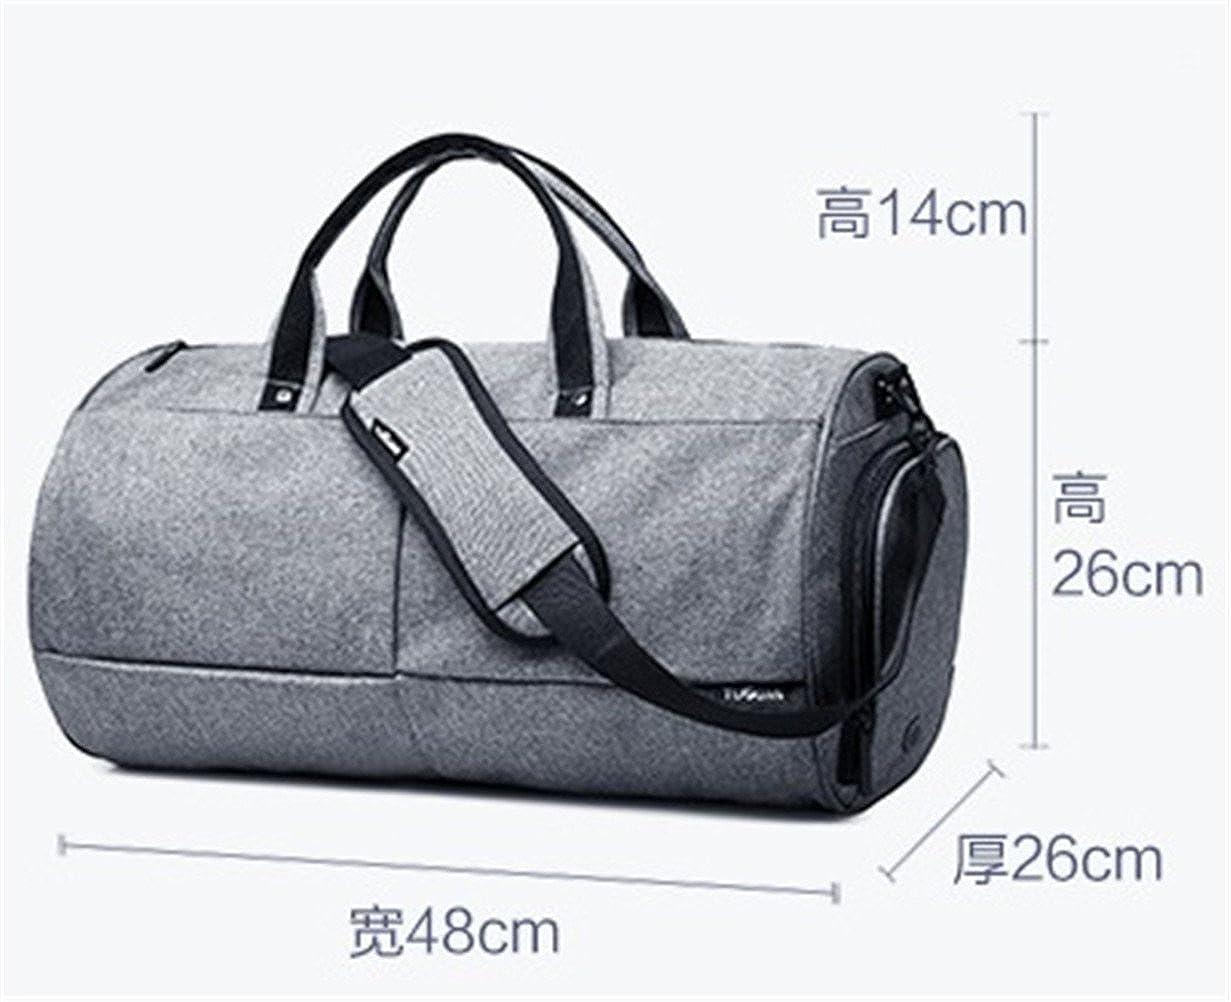 Large-capacity shoulder bag travel bag Sports fitness bag Duffel Bag